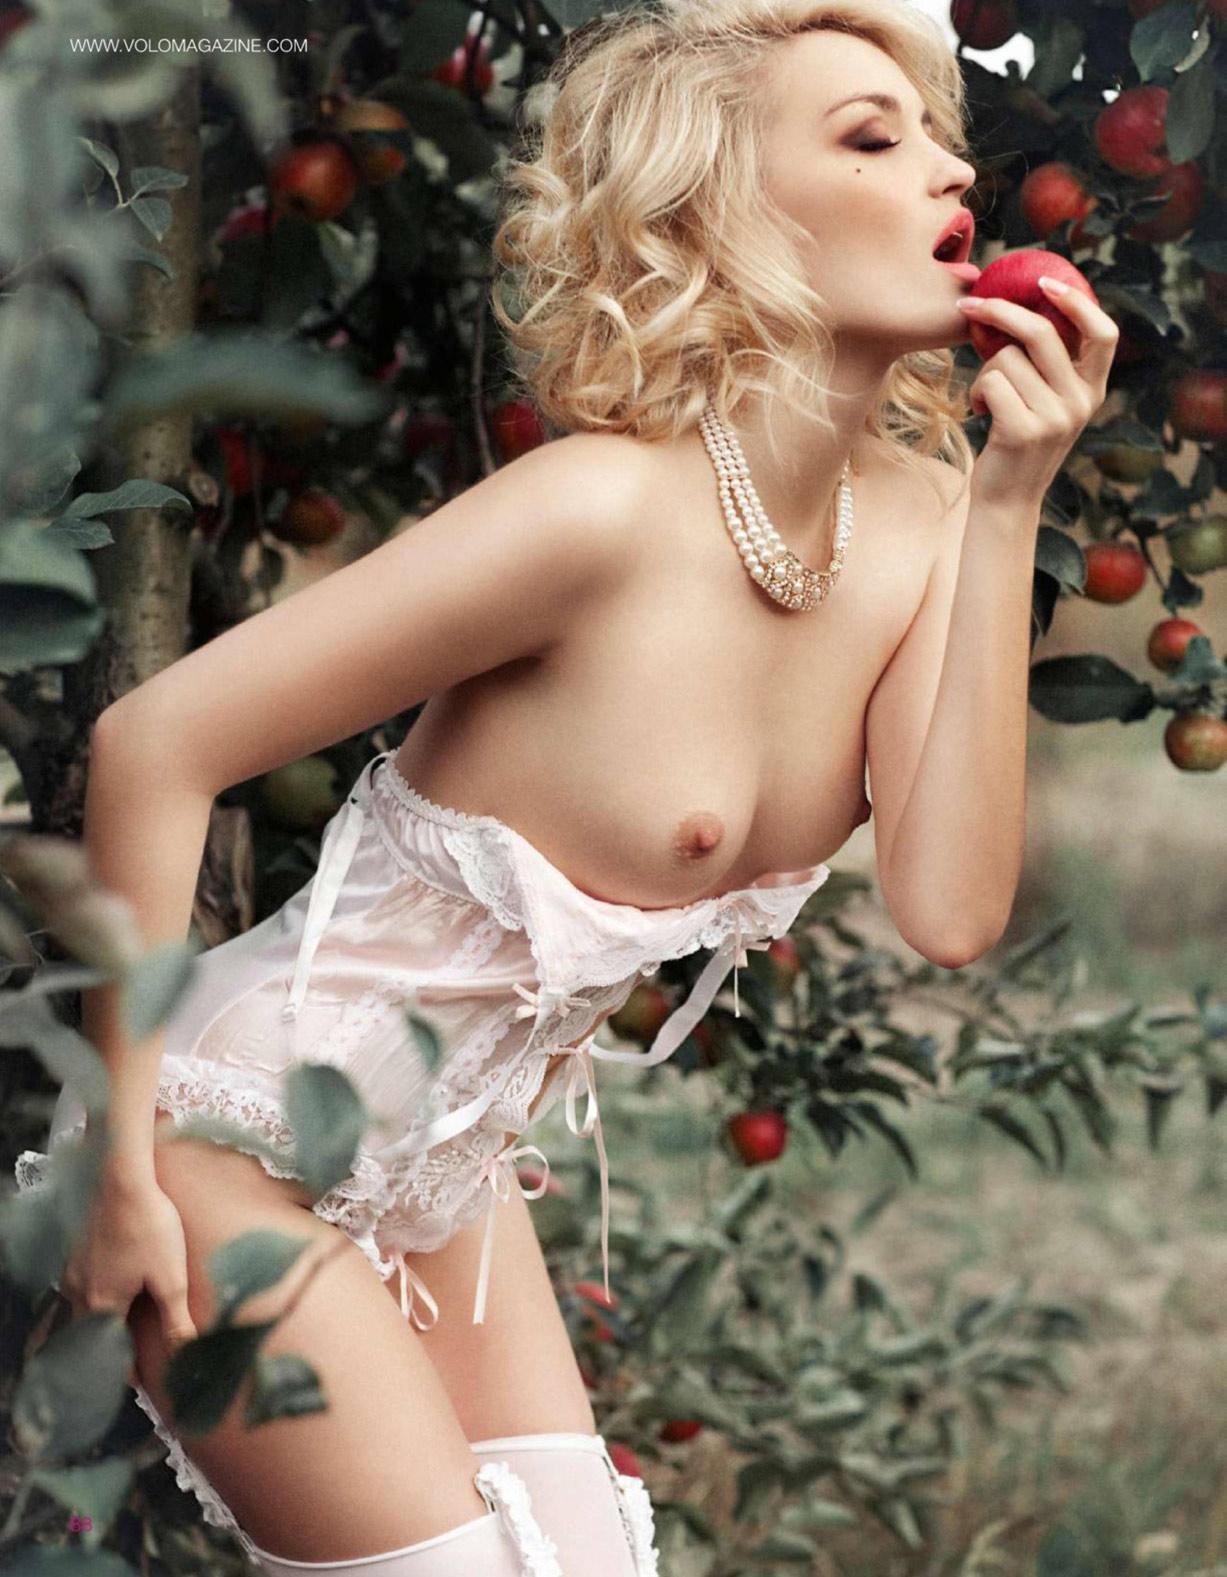 Анна Кривуца / Анна Барендрегт / Anna Barendregt by Julia Skalozub - Volo Magazine april 2014 issue 12